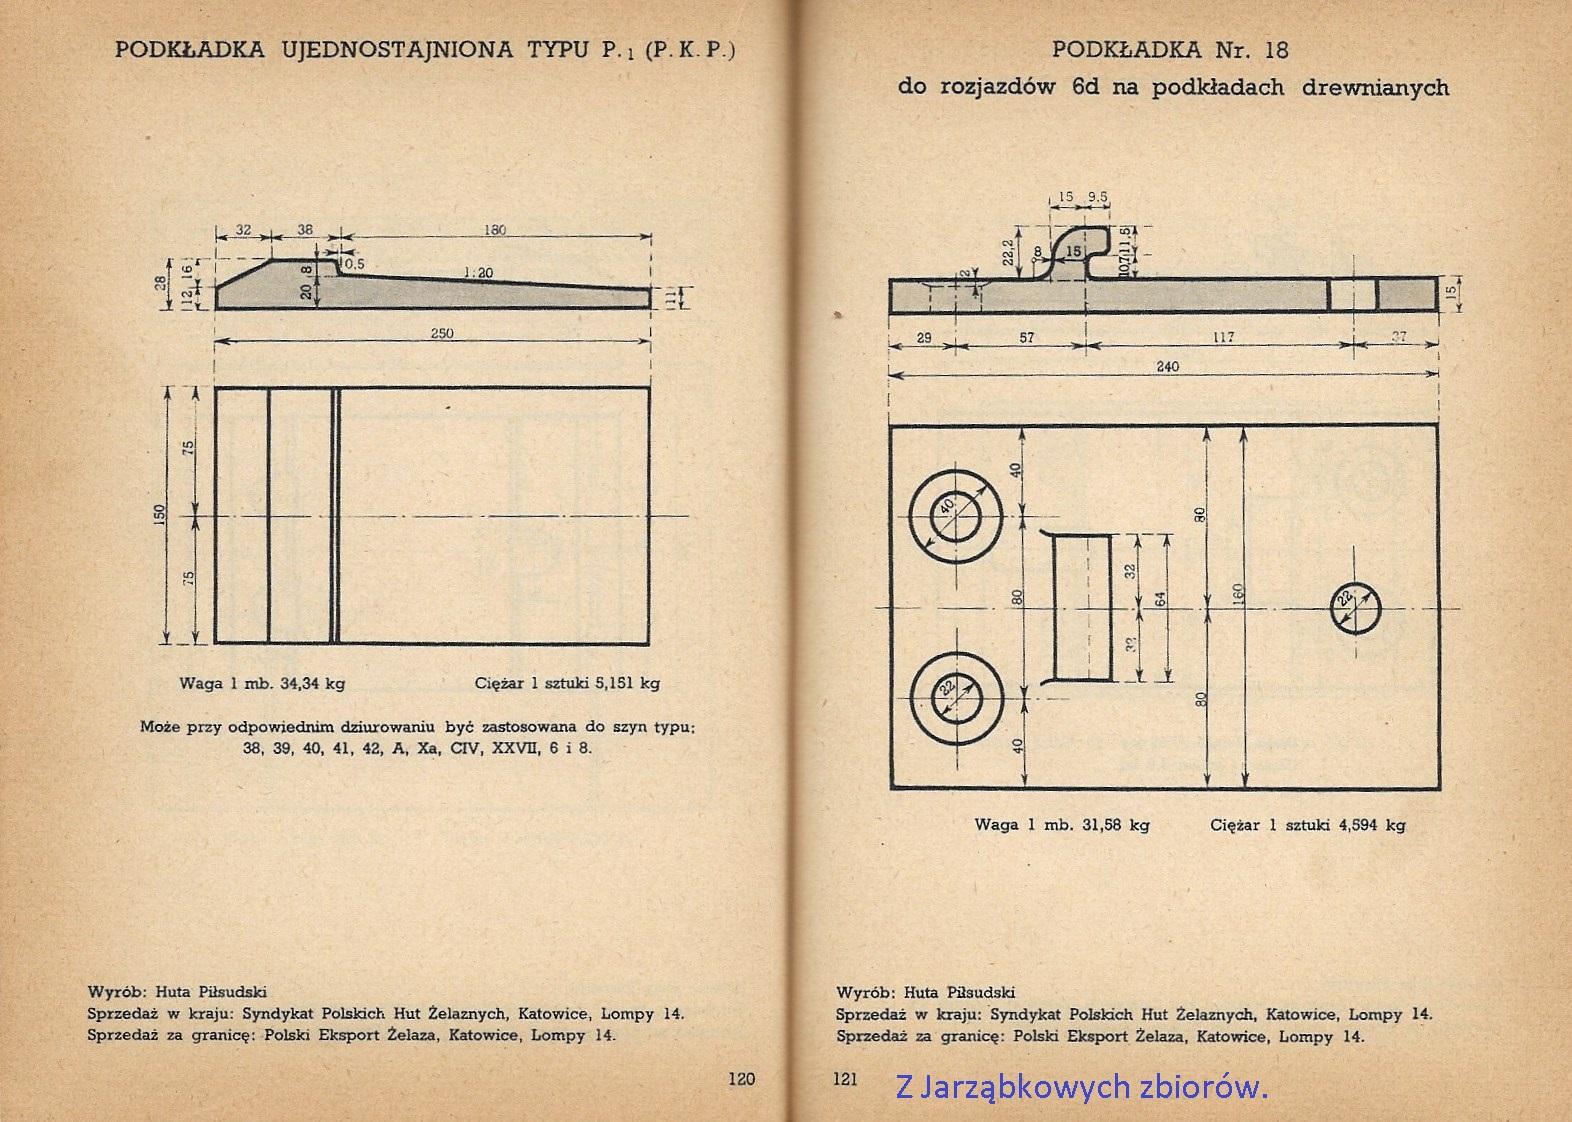 Huta Piłsudski - Podkładki.jpg